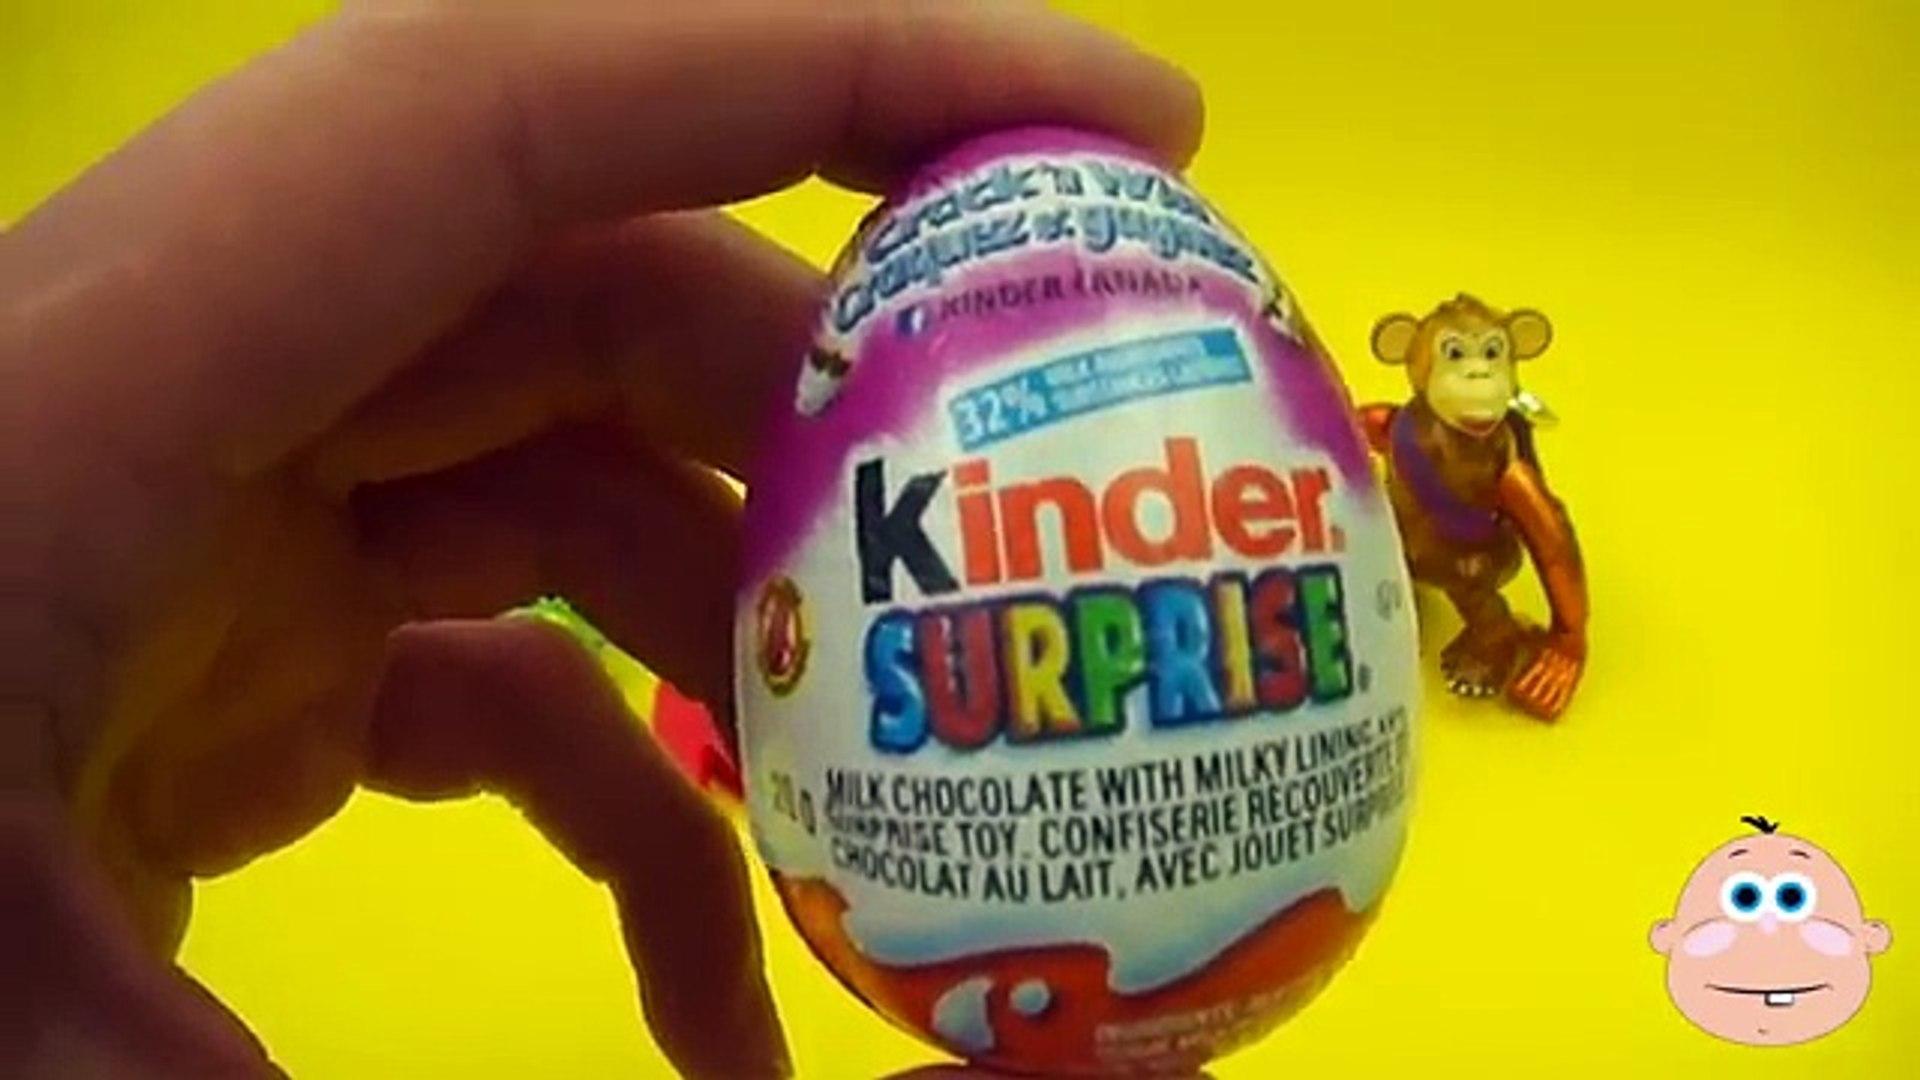 И б б б б б яйцо Яйца Добрее Learn-A-слово Урок письма Написание сюрприз преподавание разворачивания